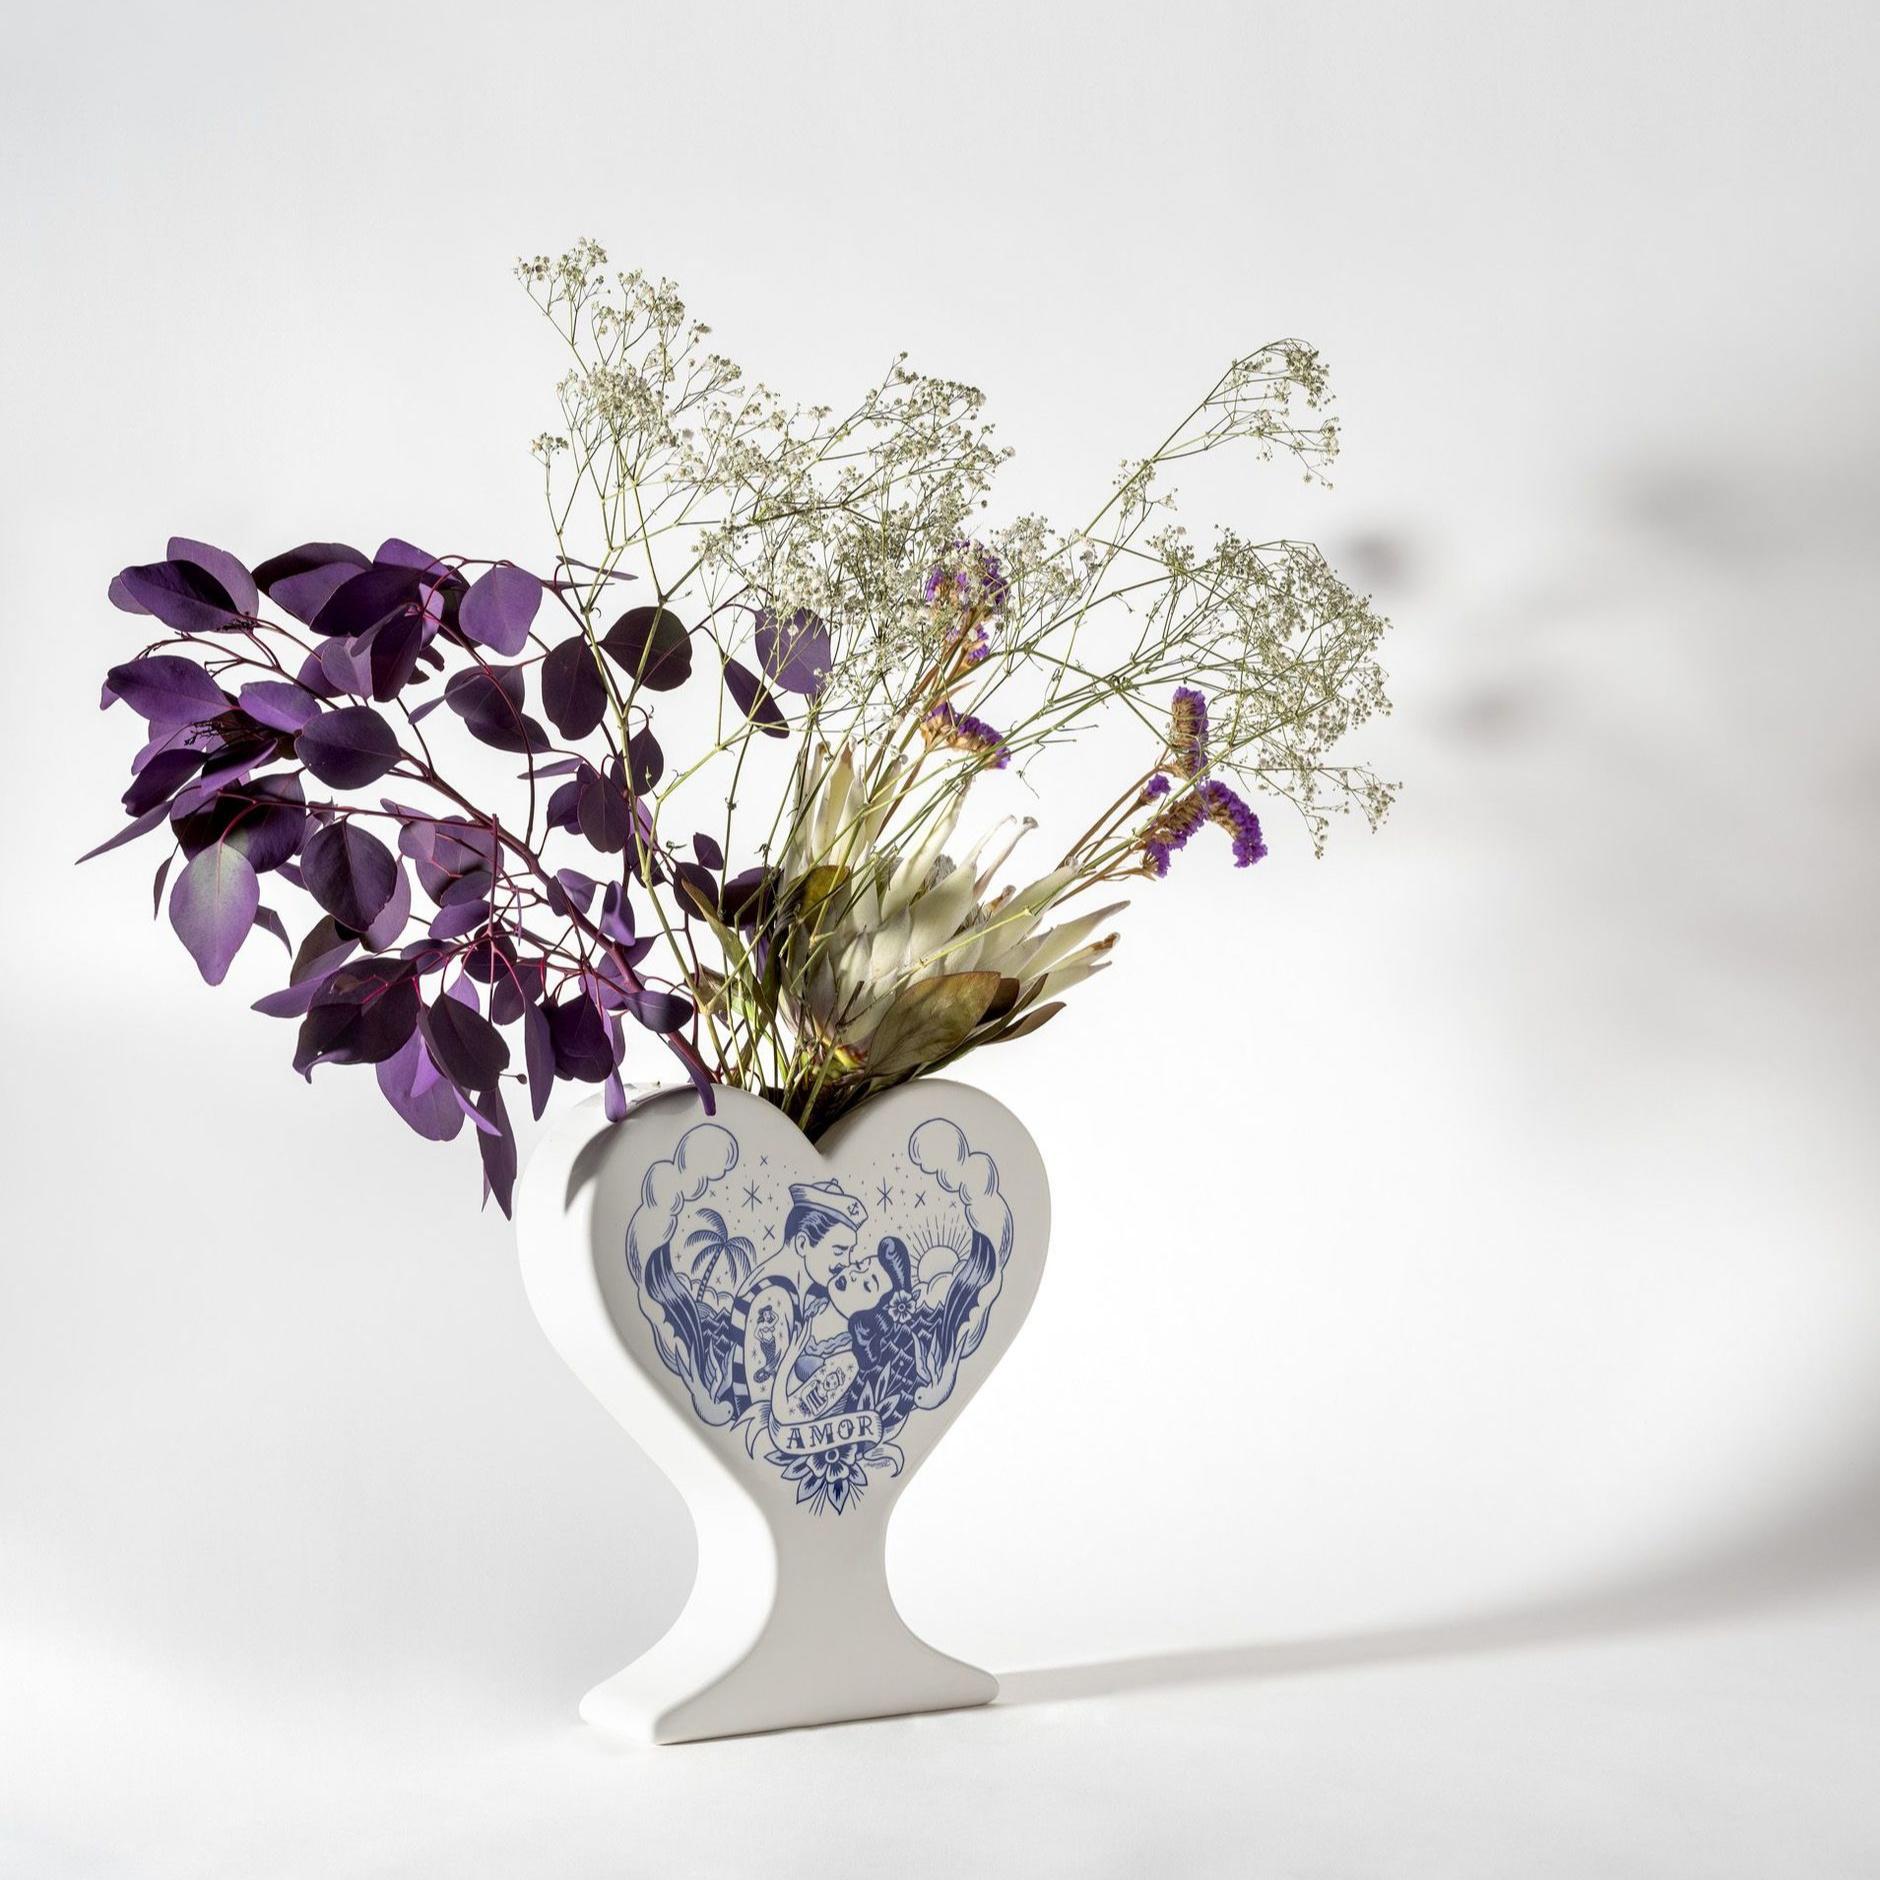 15 ваз в форме сердца: выставка в Мадриде (галерея 6, фото 3)